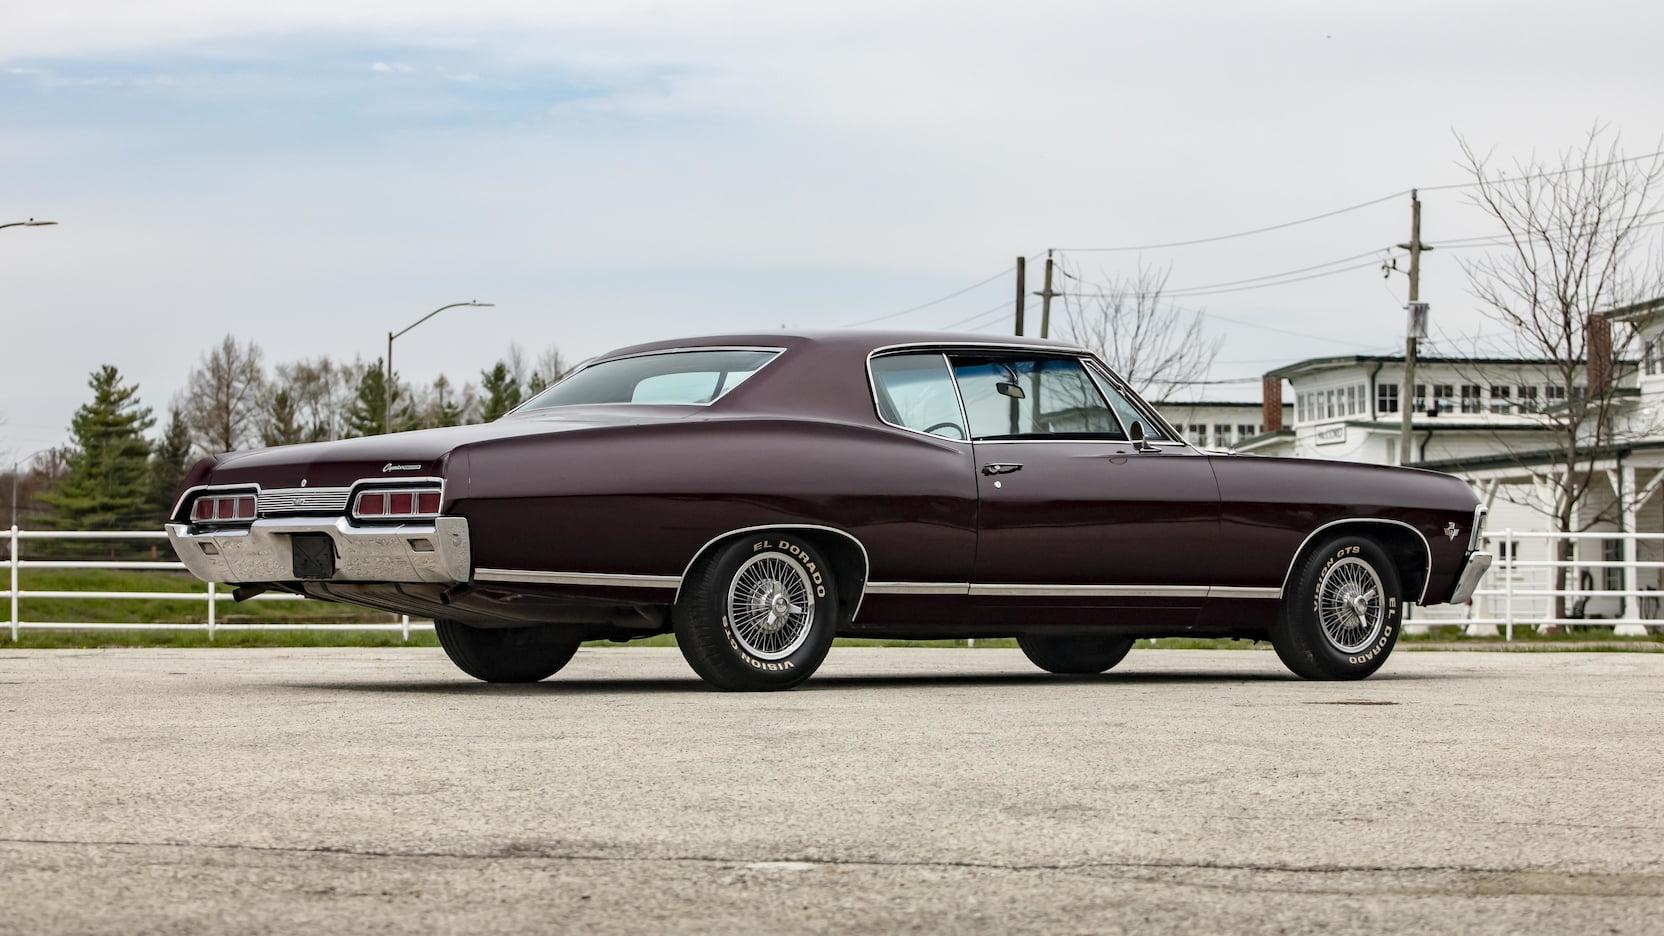 1967 Chevrolet Caprice side